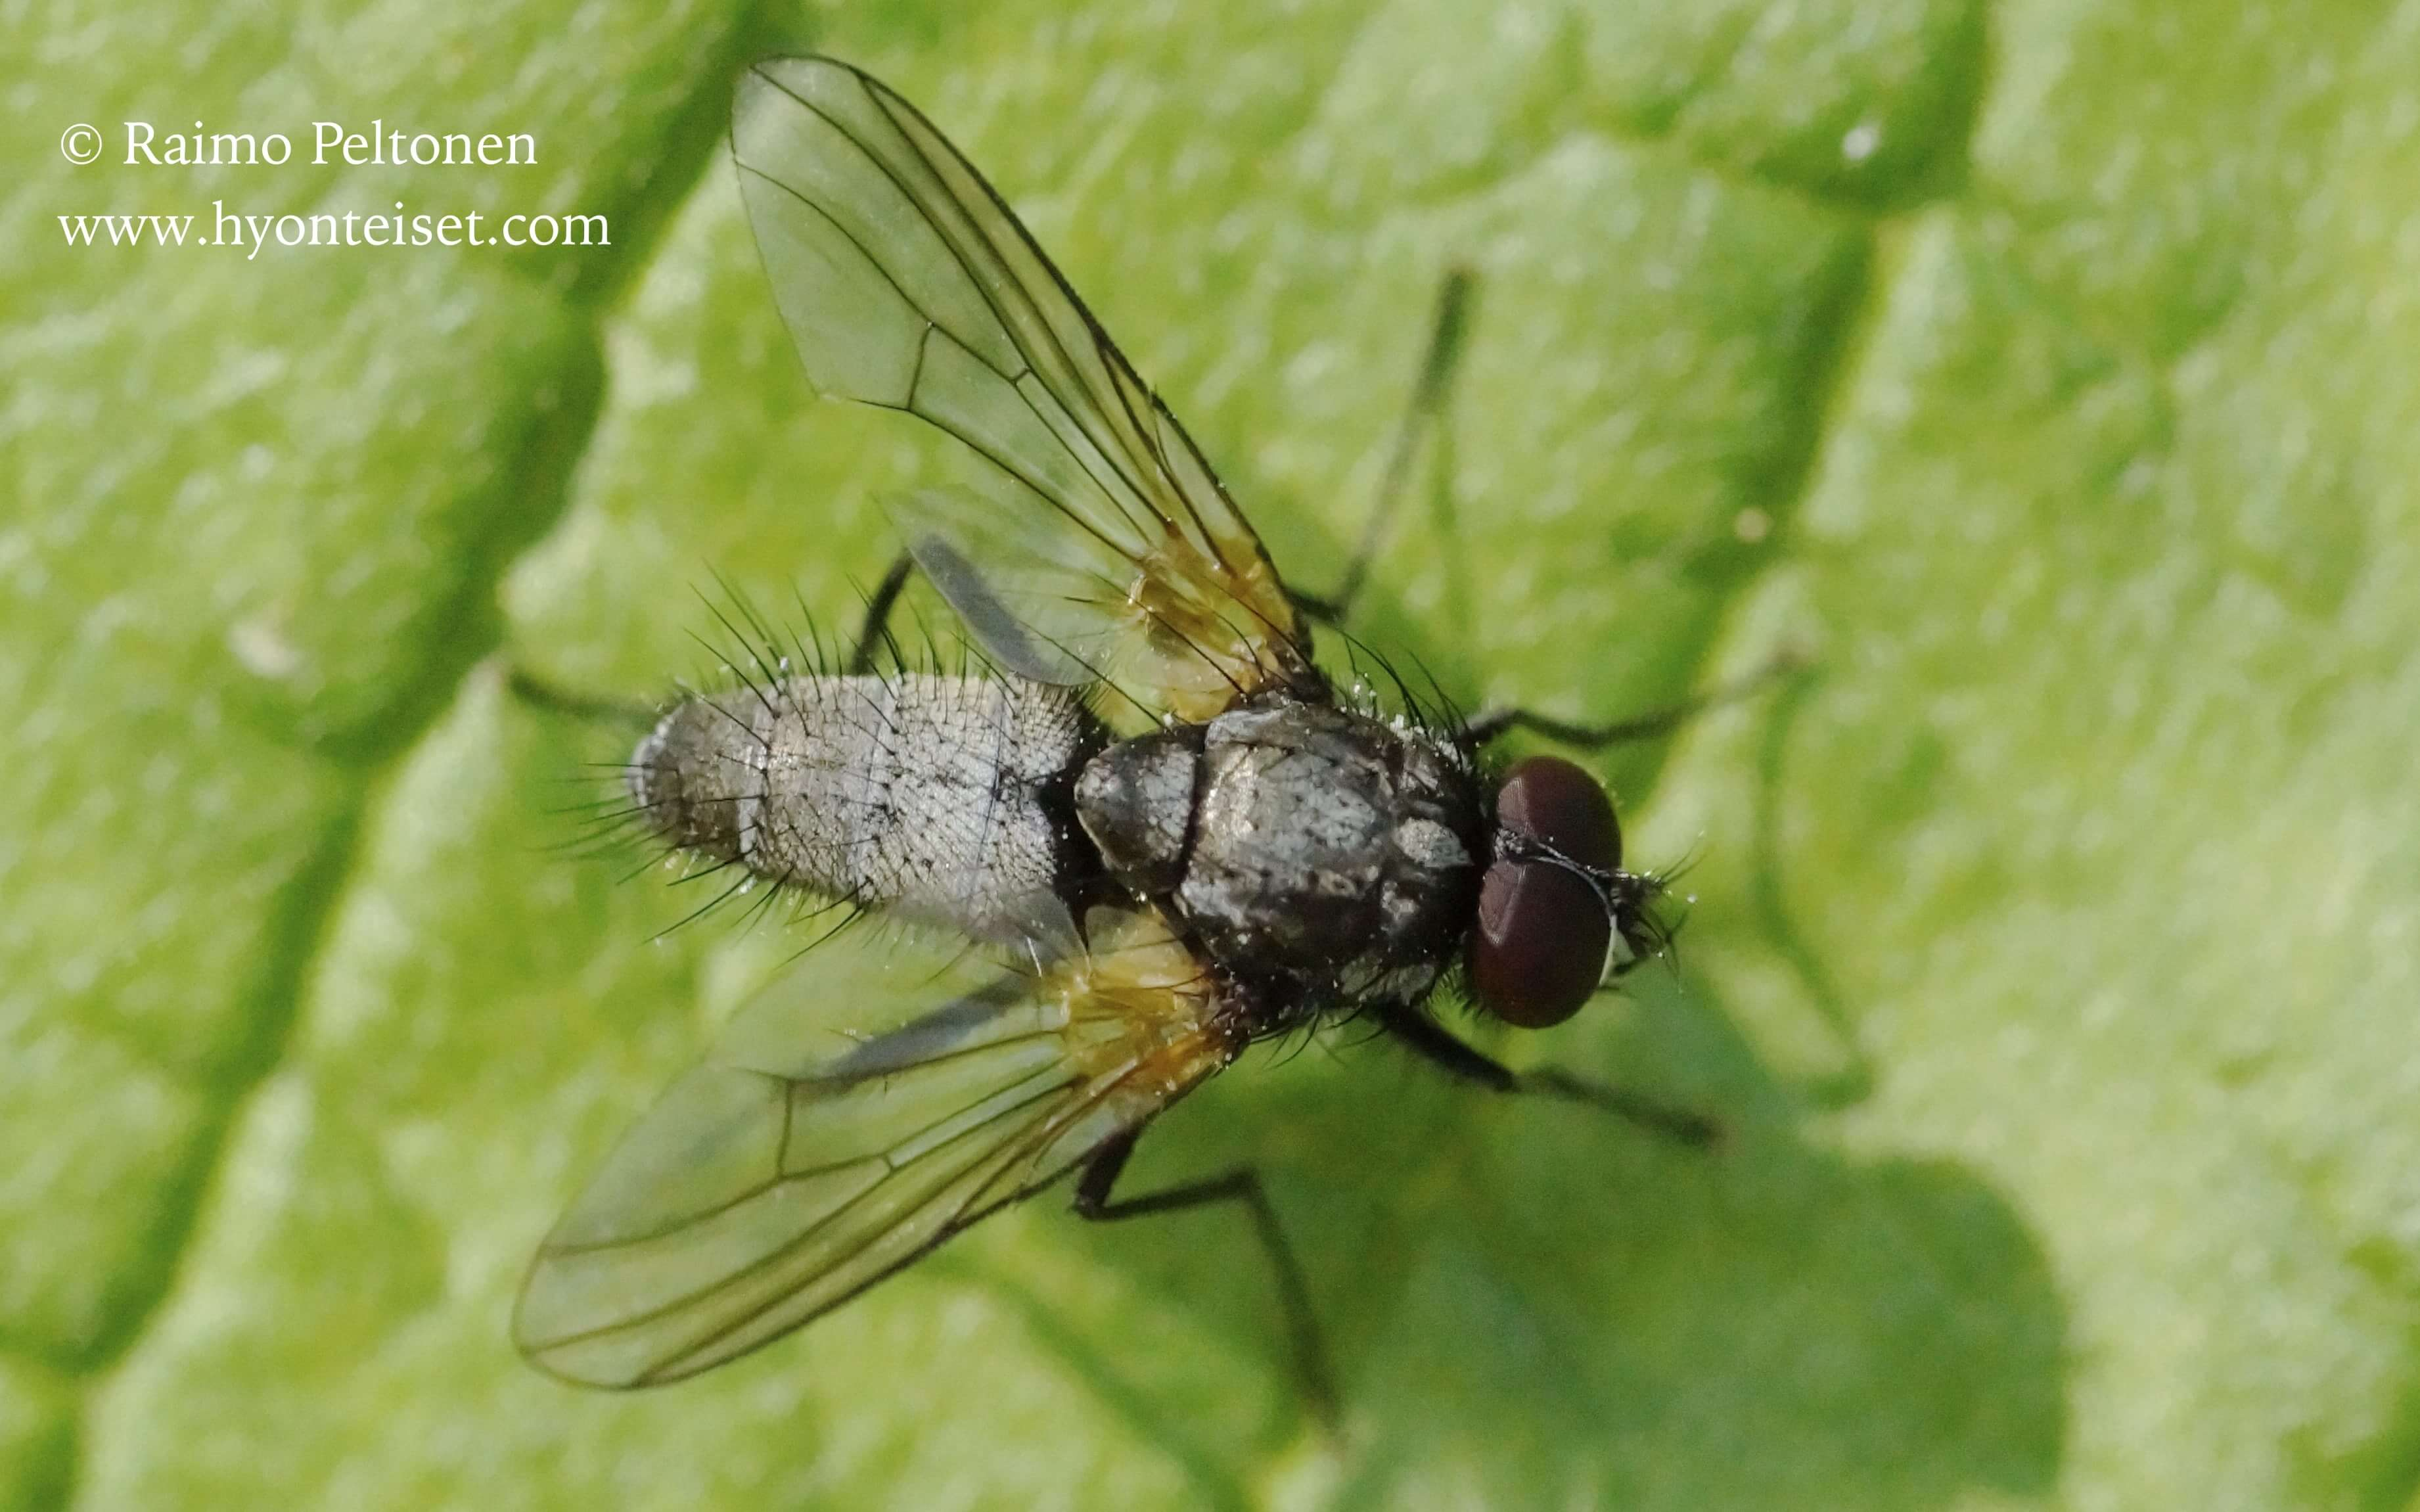 Thricops cf. nigricornis (det. Stephane Lebrun)